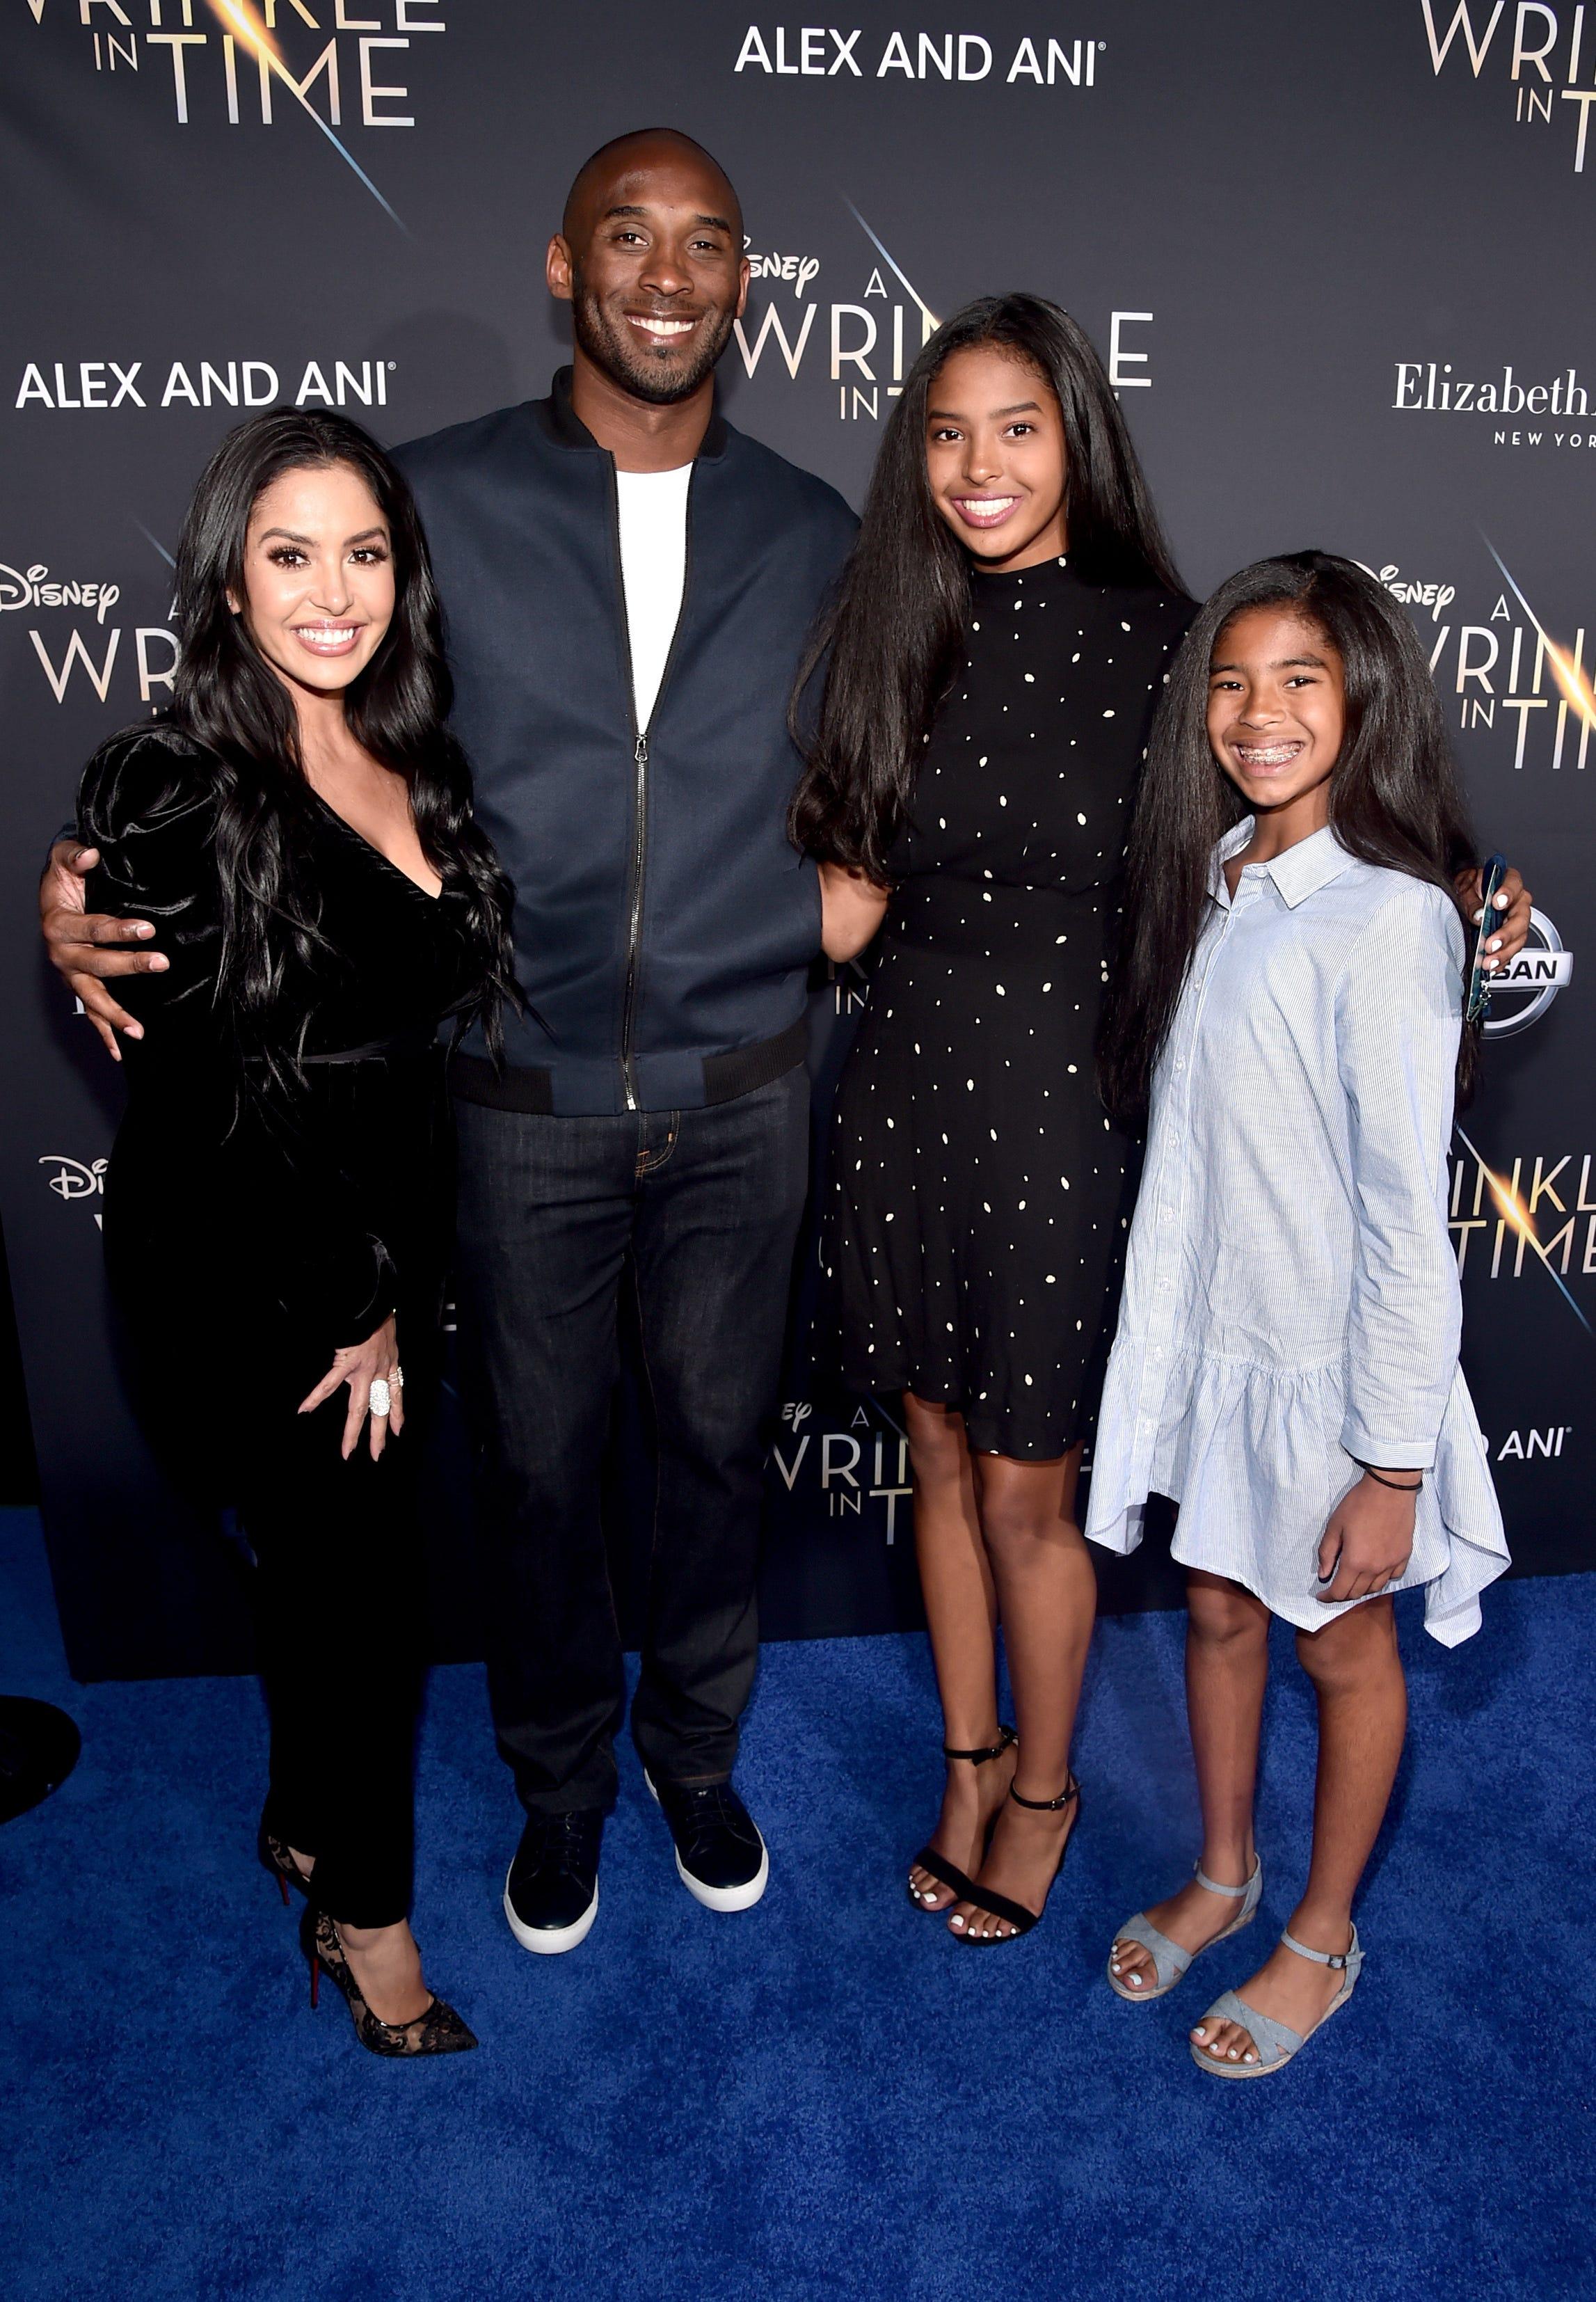 The Bryant family, from left, Vanessa, Kobe, Natalia and Gianna, shown in 2018.